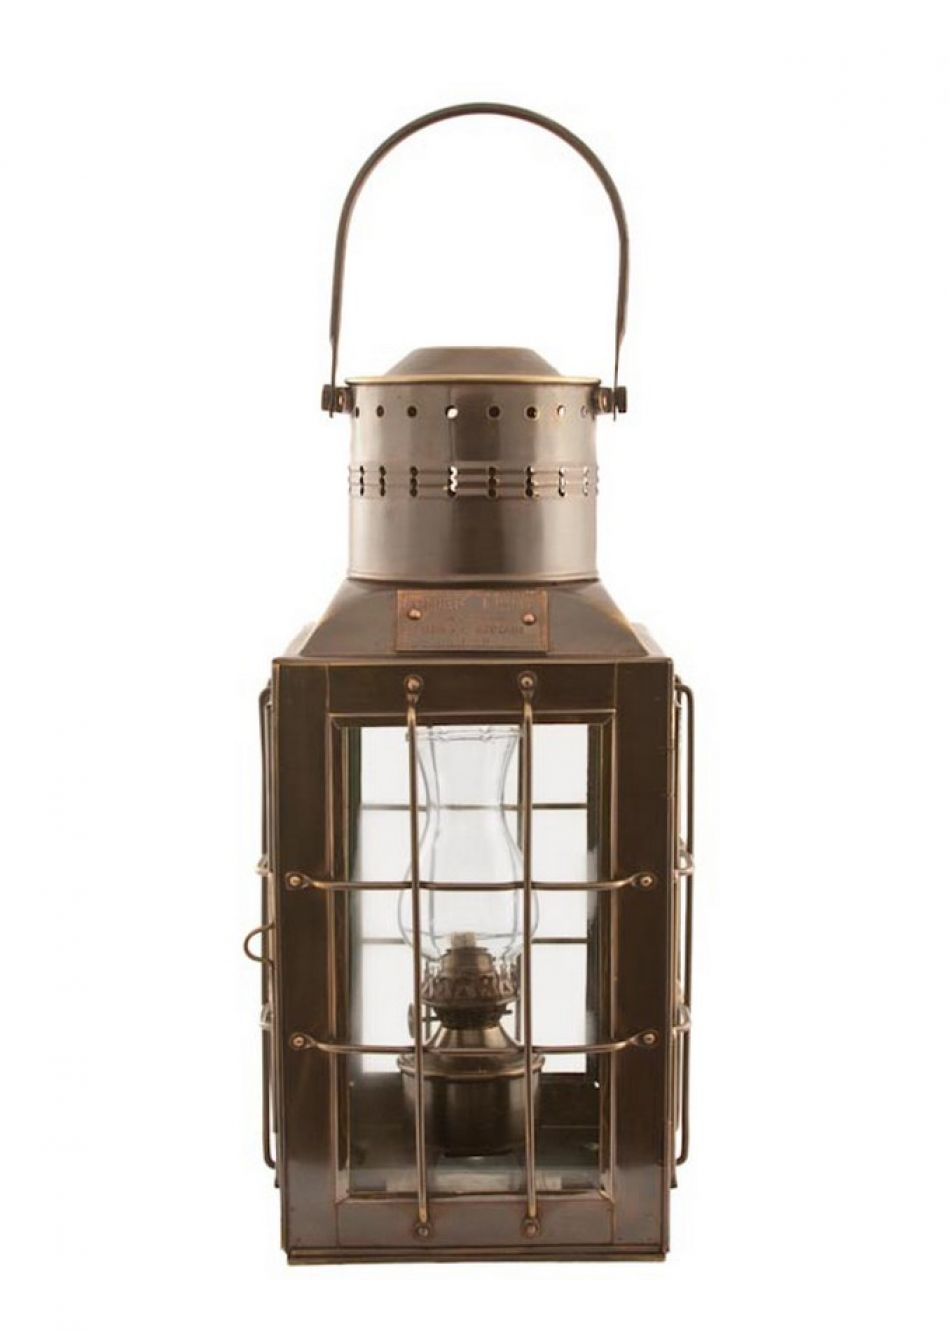 Buy Antique Brass Chiefs Oil Lamp 15in Model Ships